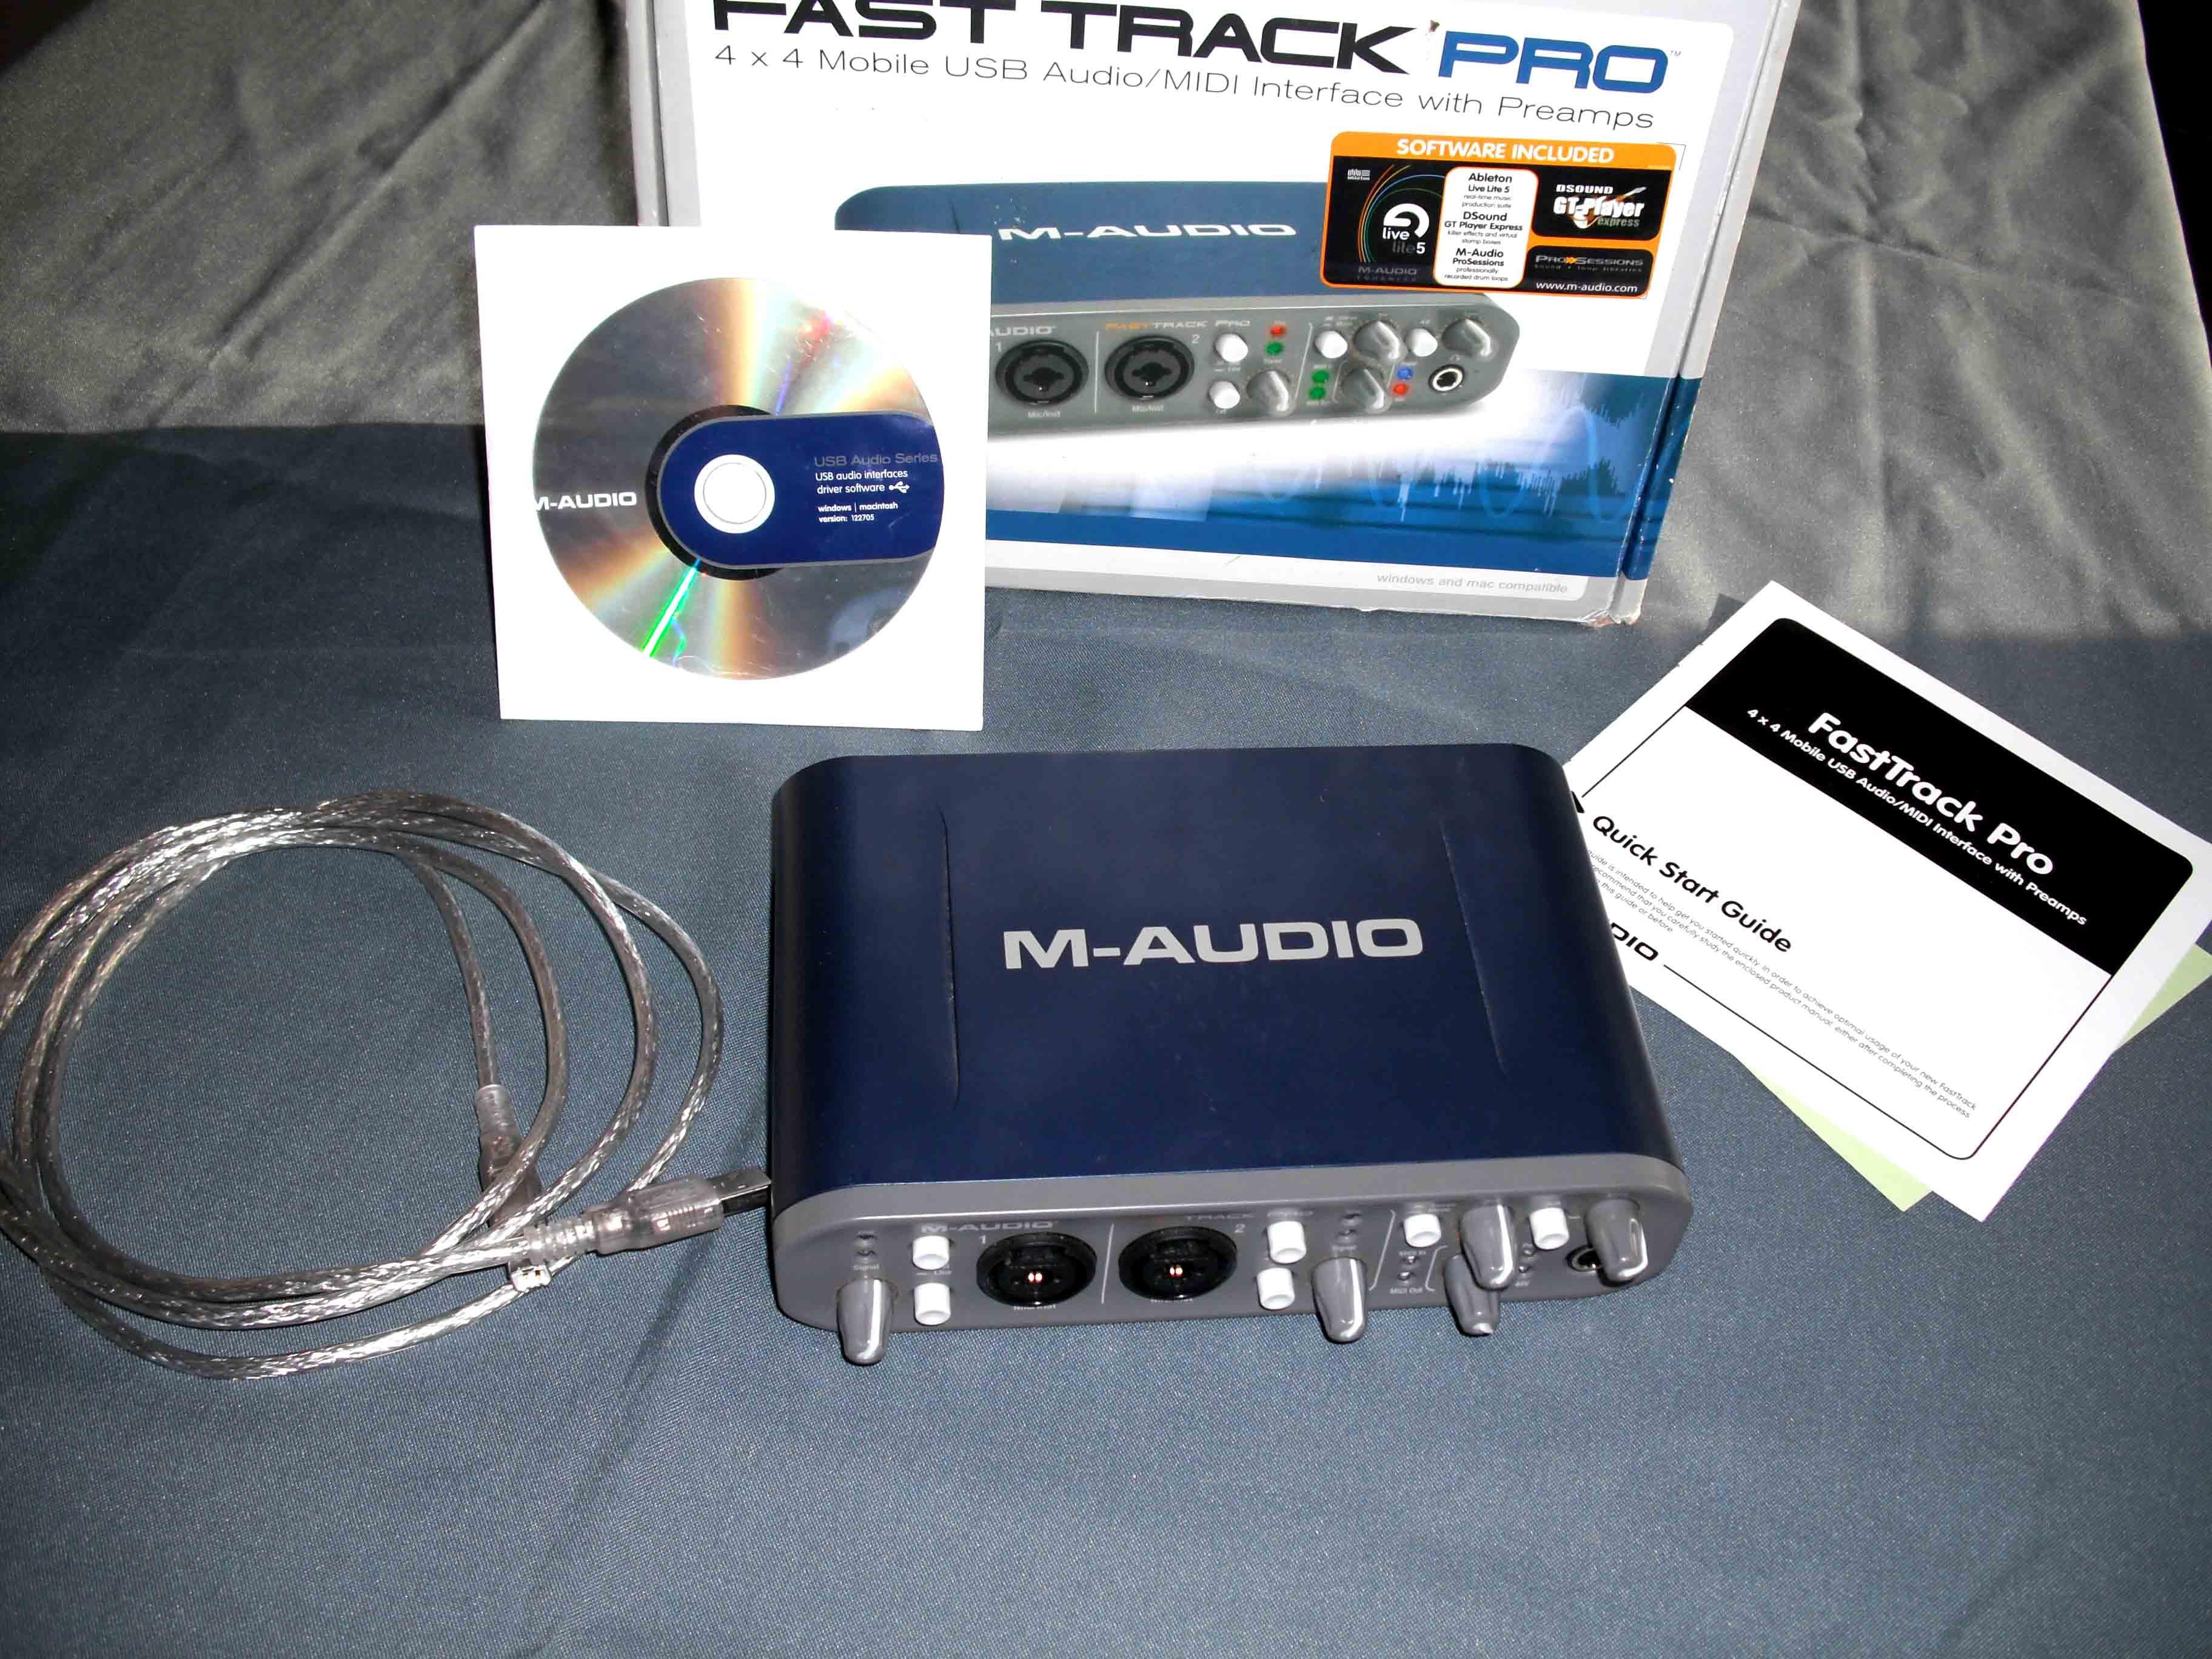 M-audio Fast Track Pro Image   228557